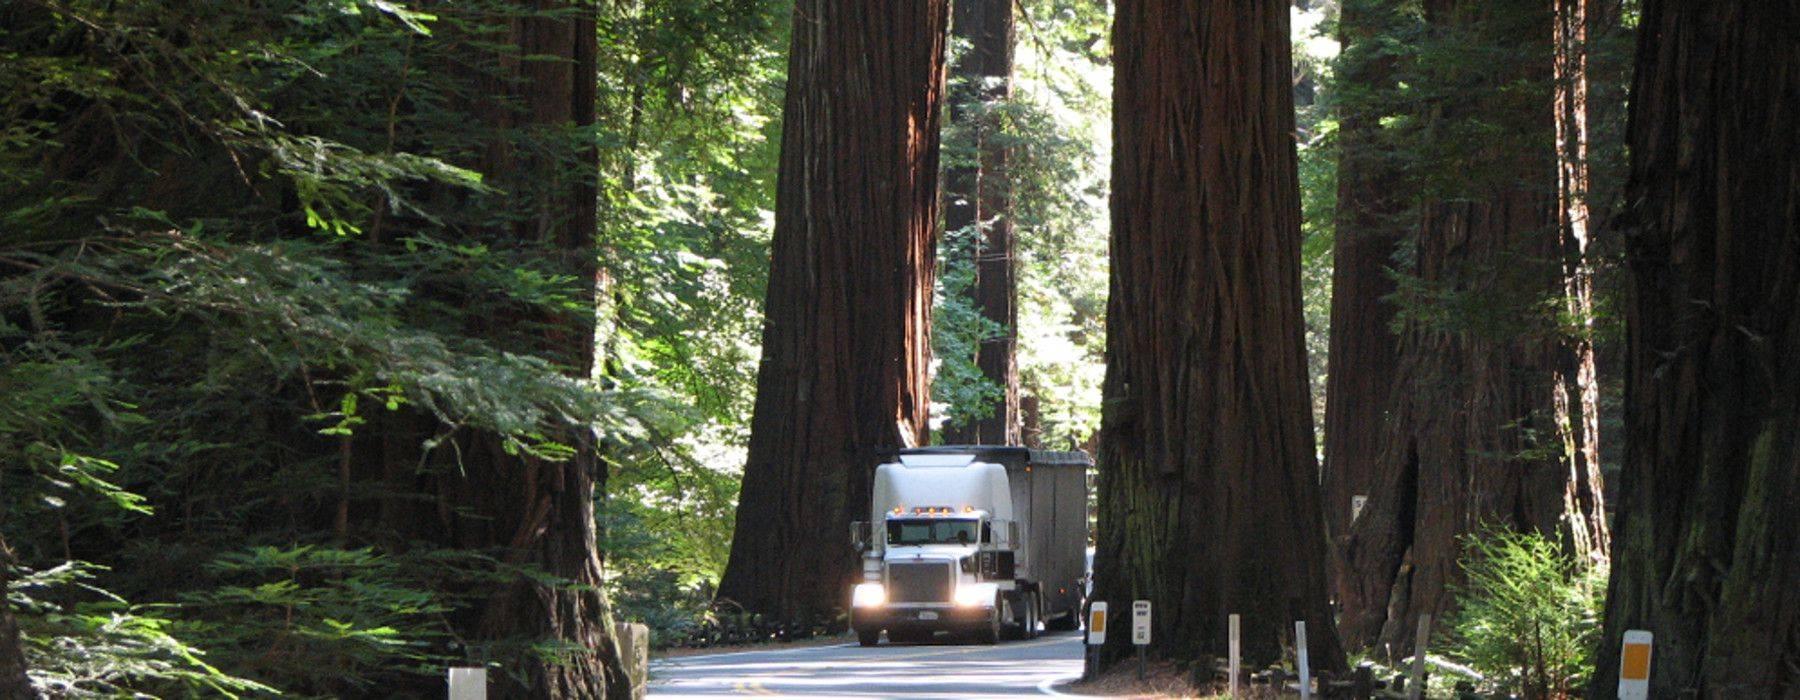 Green Trucking Companies